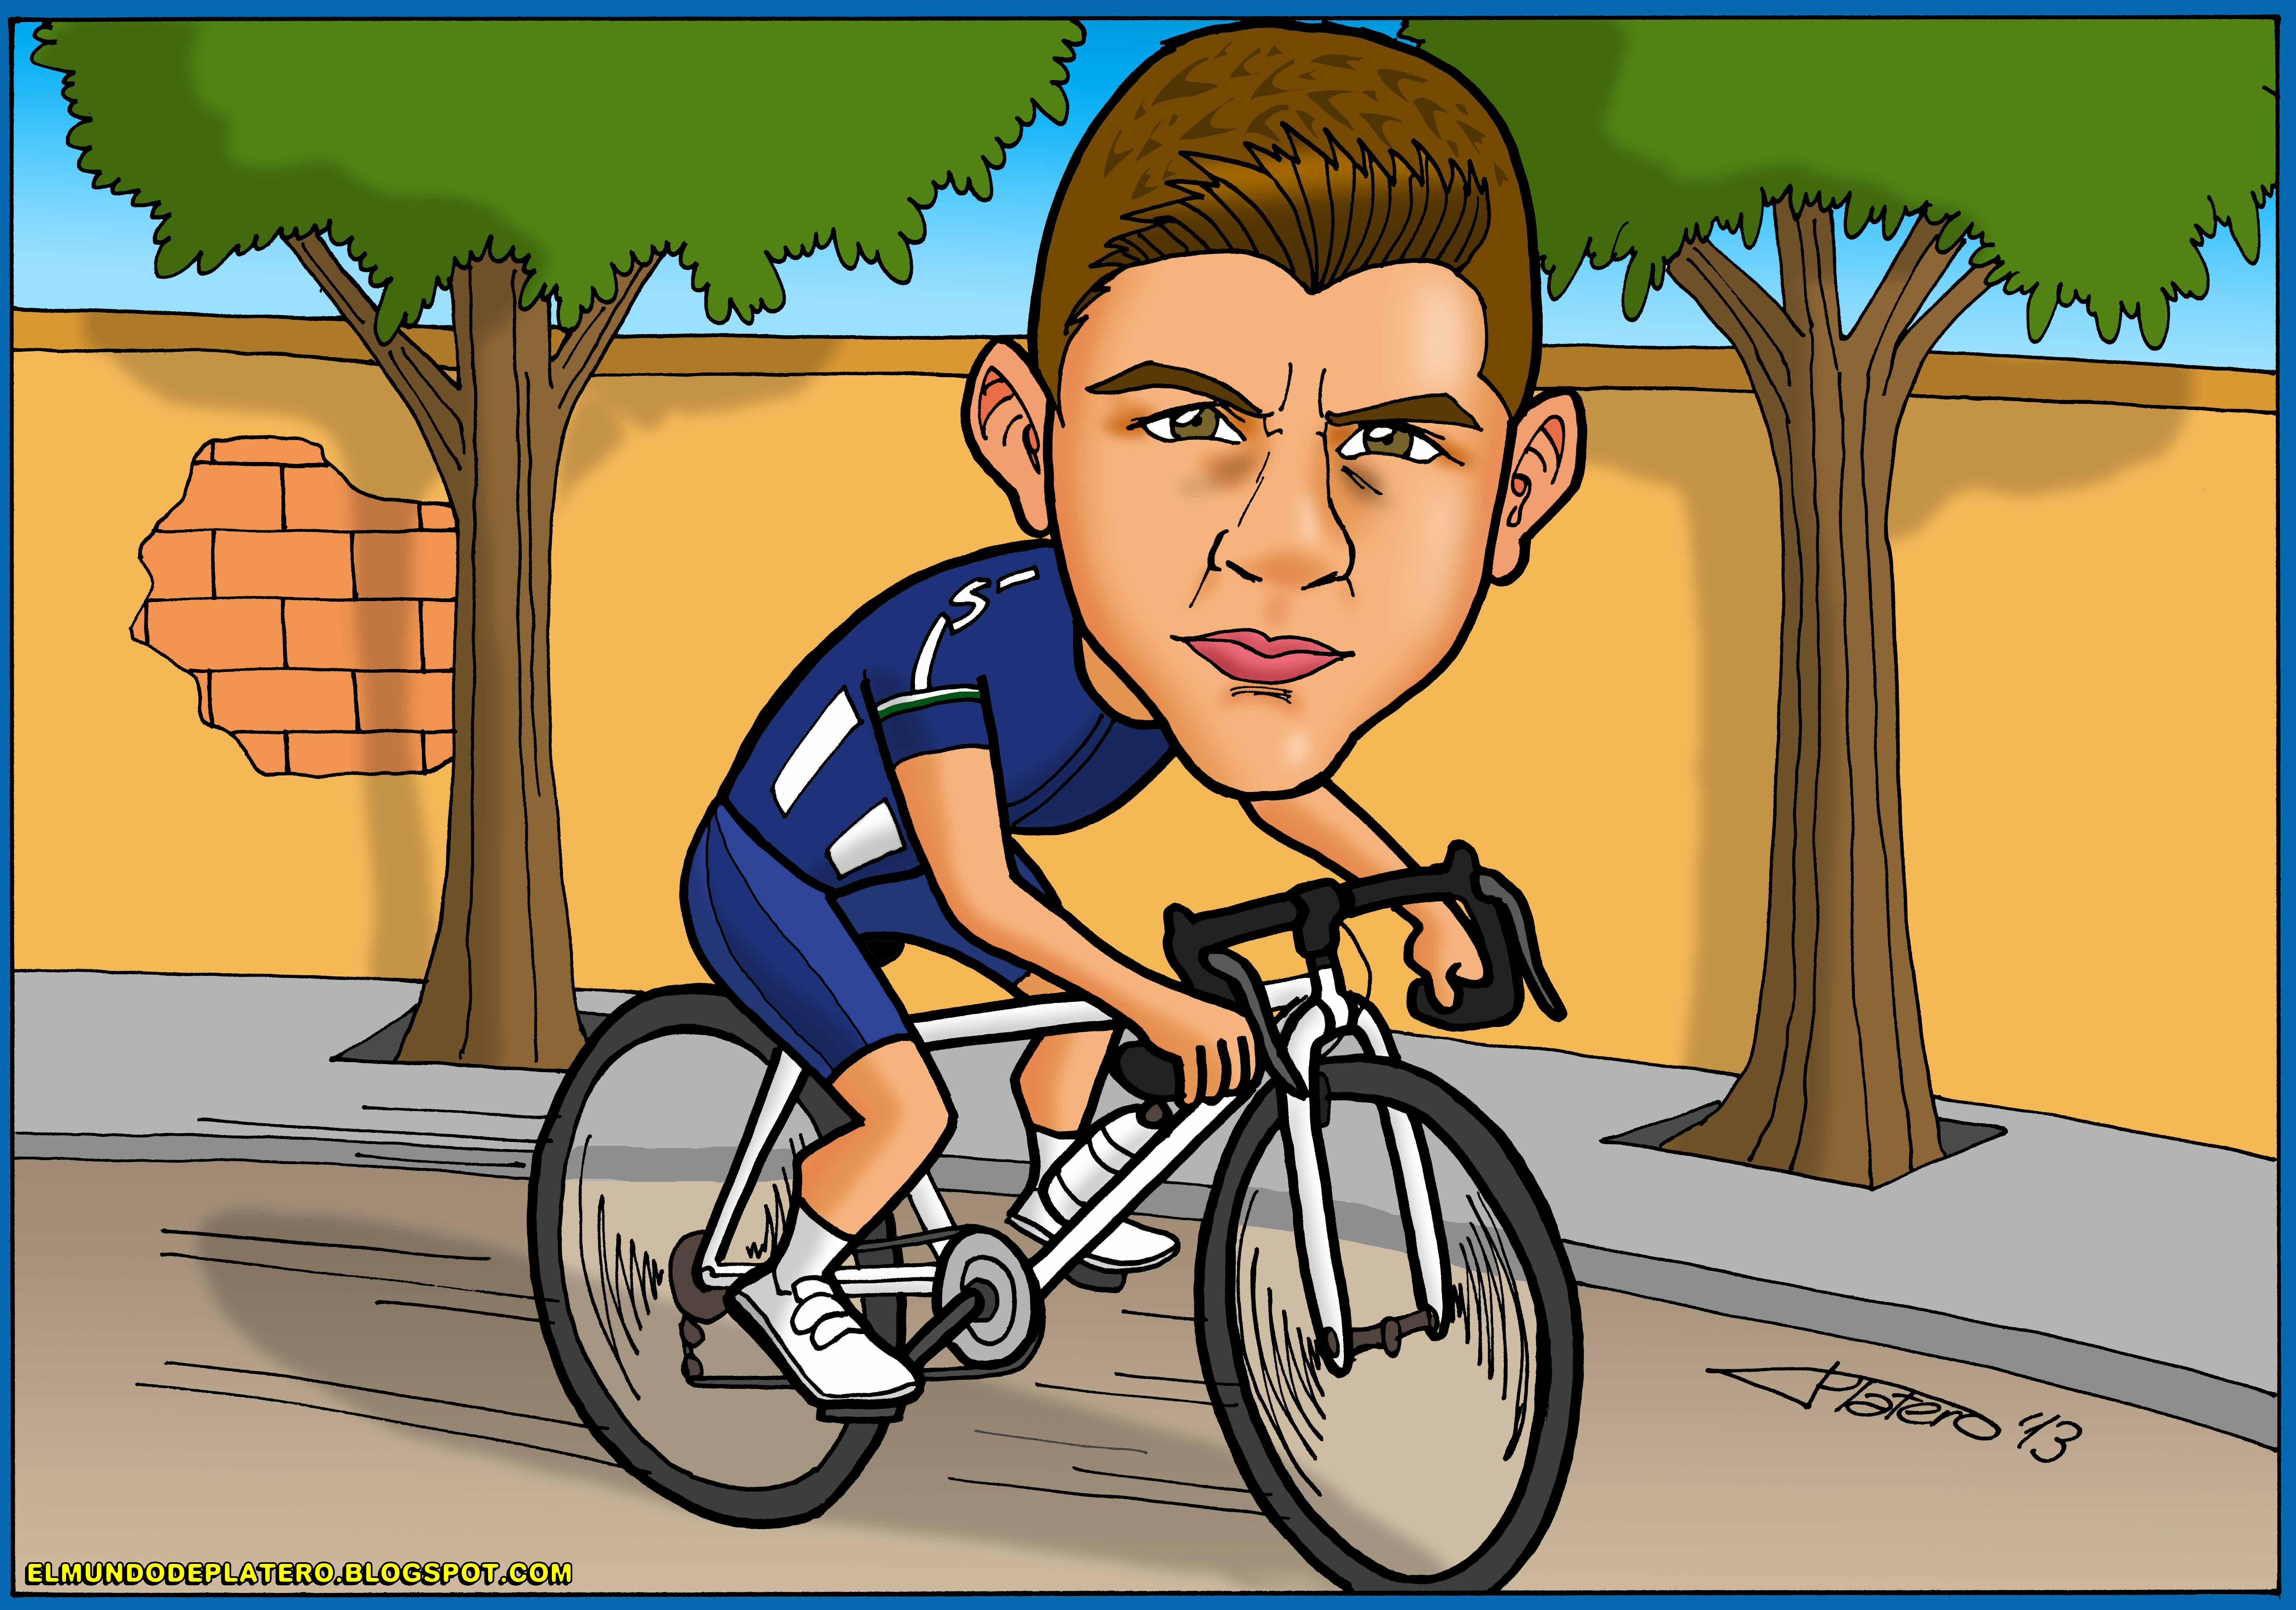 caricaturas a color por encargo personalizadas_ciclista1_elmundodeplatero copia